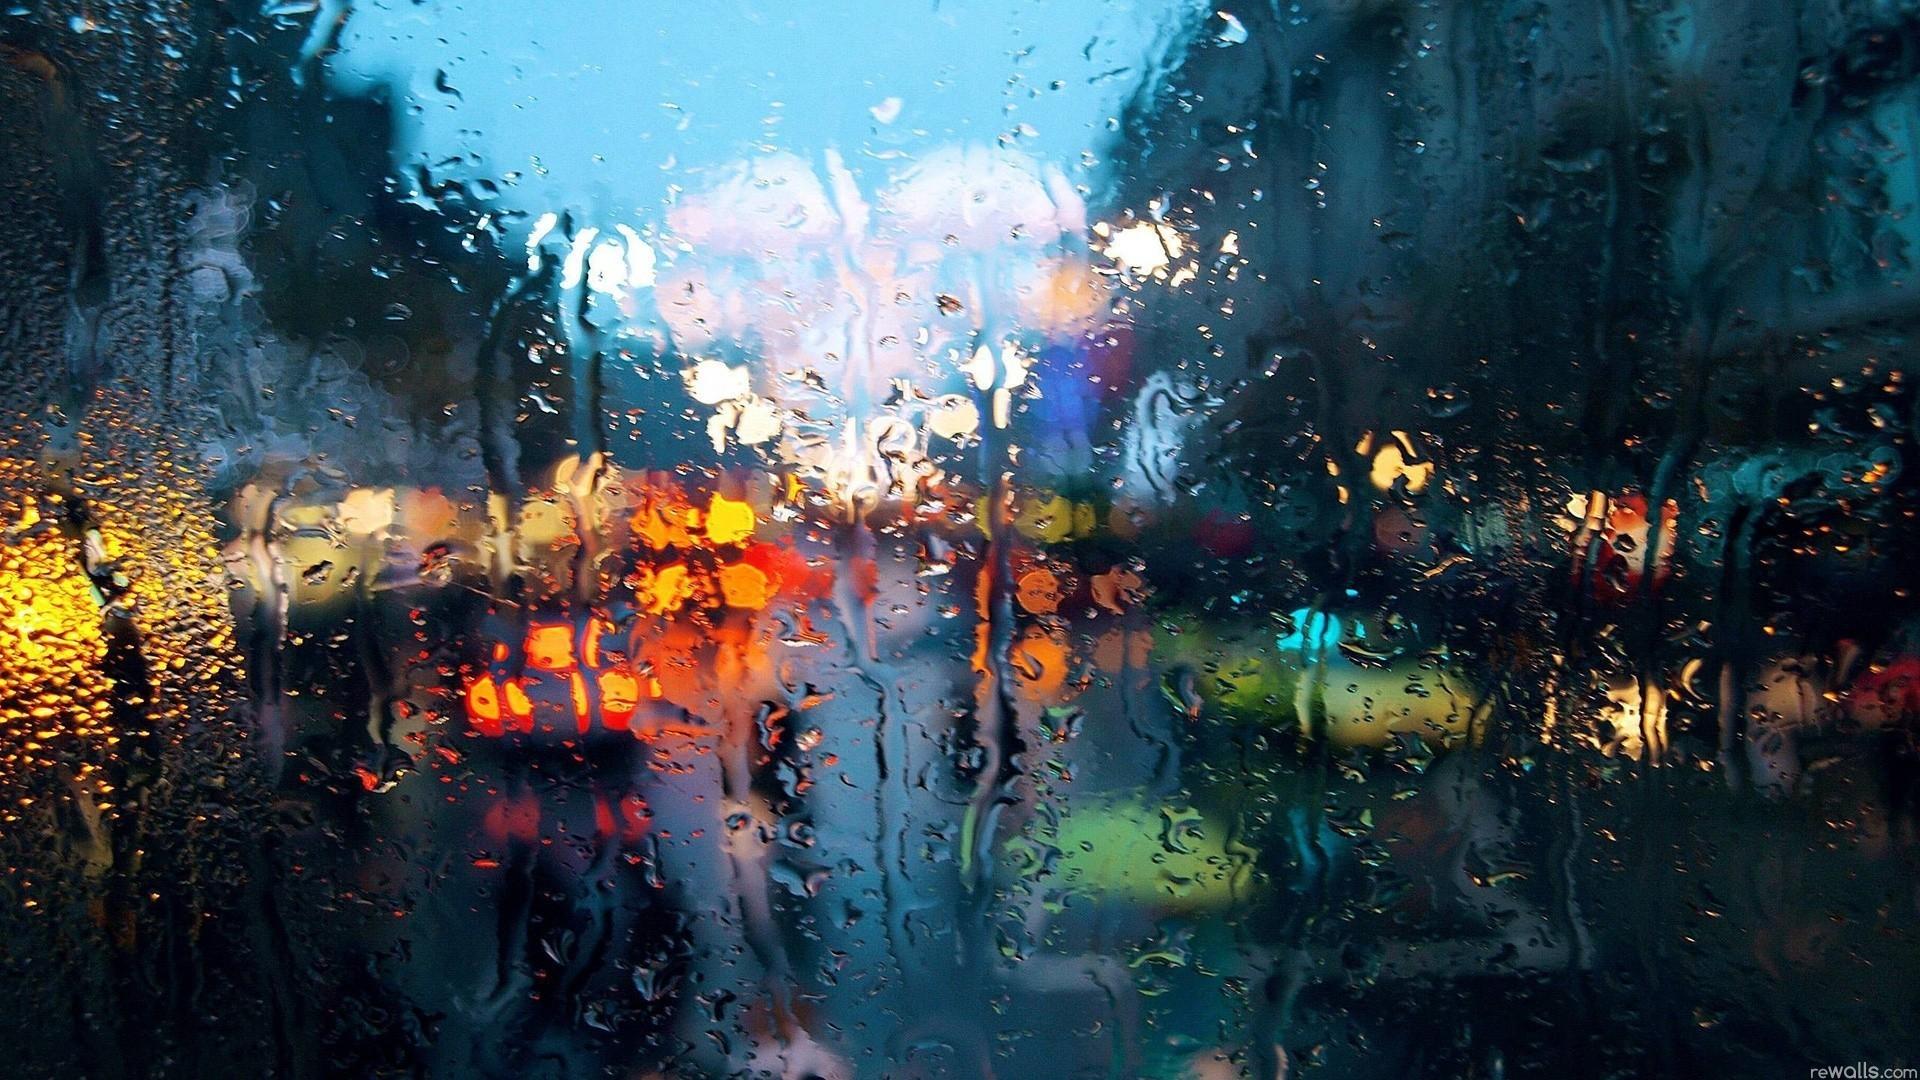 General rain city glass water drops window bokeh water on glass FaZe  Rain lights